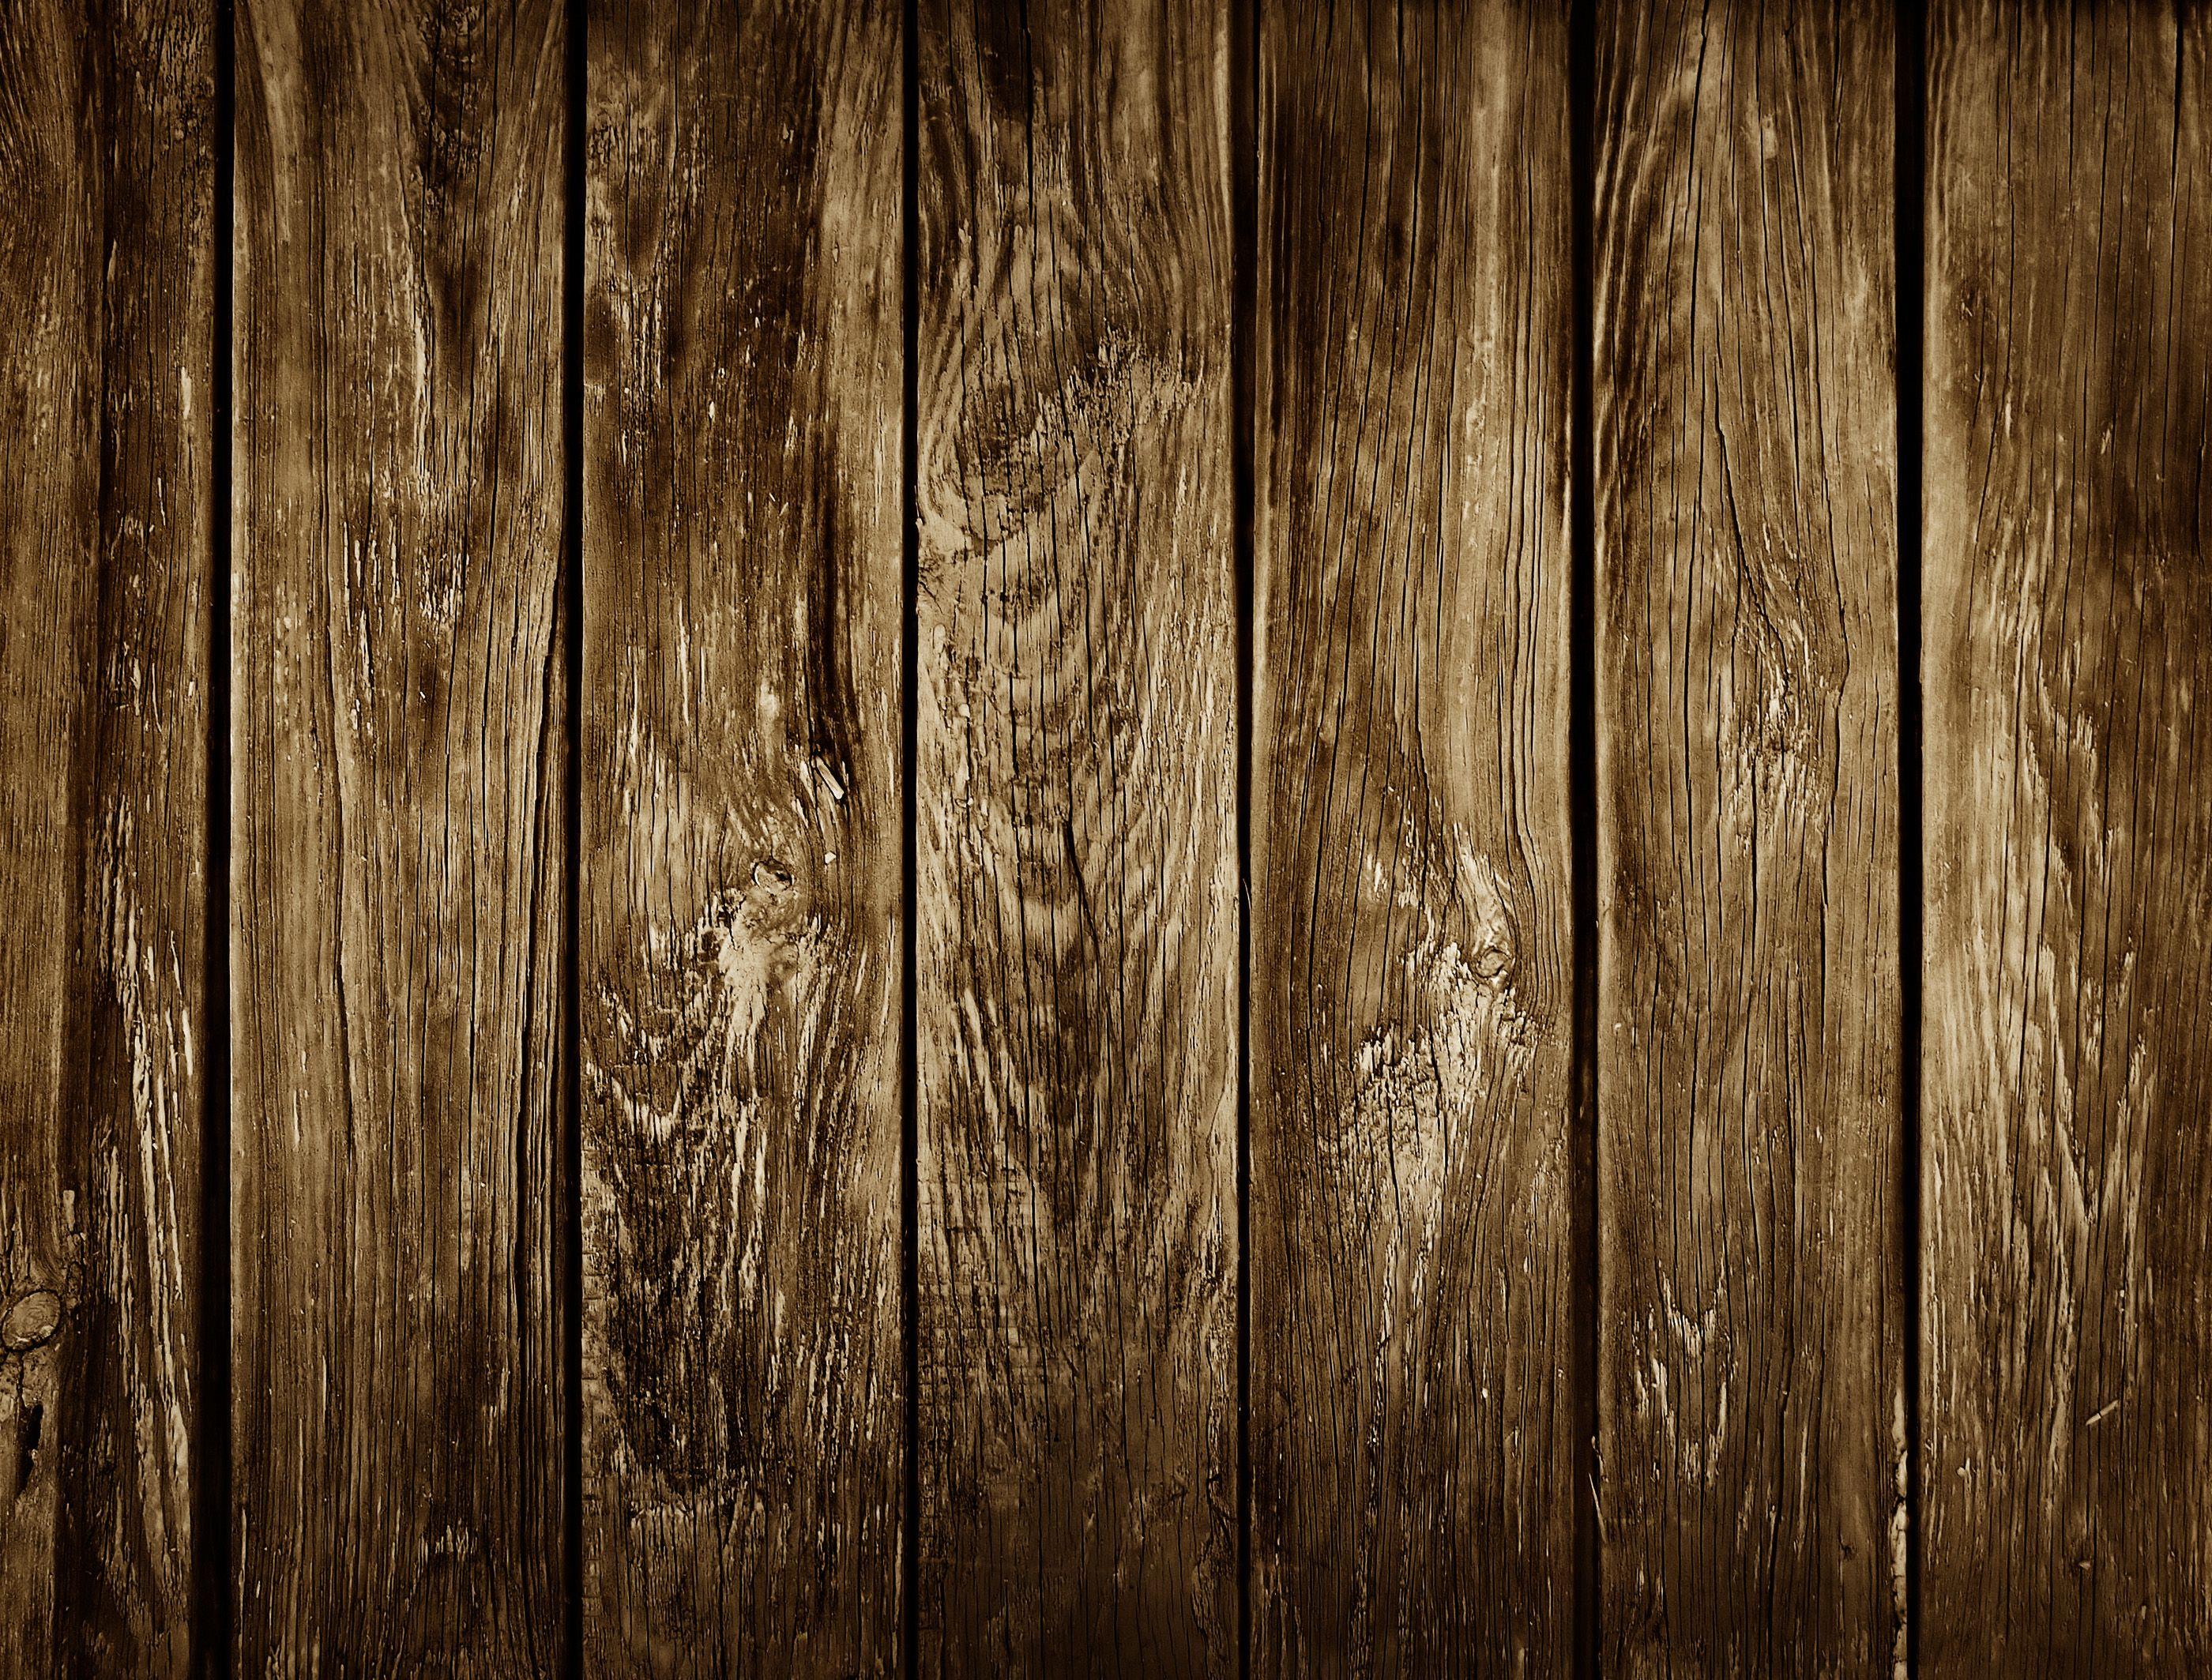 Dark wood texture Fondos de pantalla hd, Texturas para